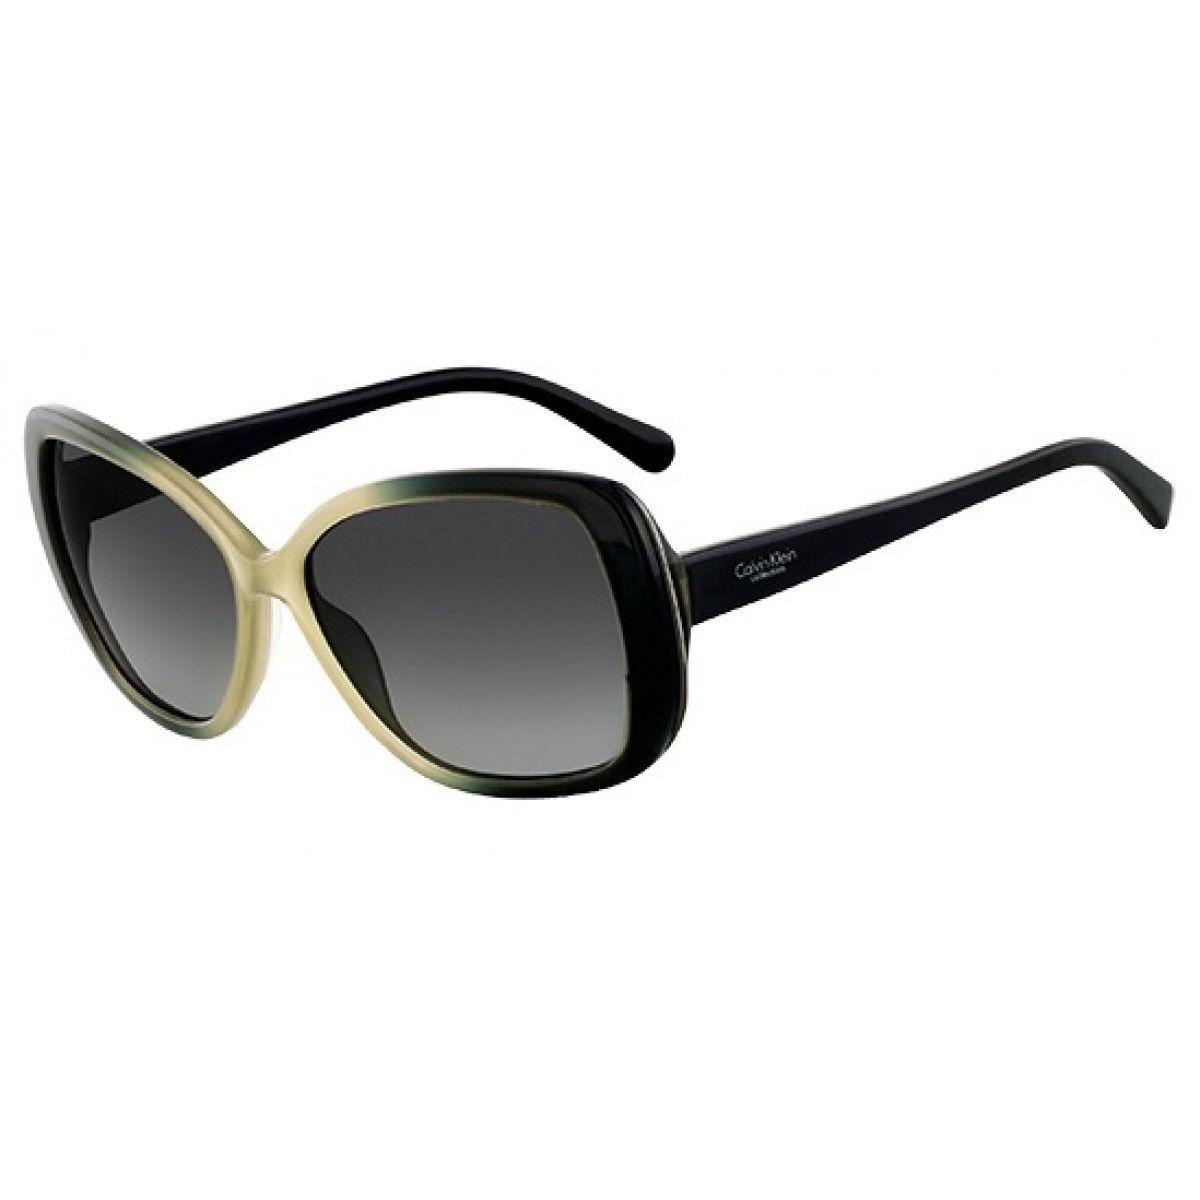 Calvin Klein Sun ck7859s - Eyeglass.com #womens #sunglasses #fashion ...